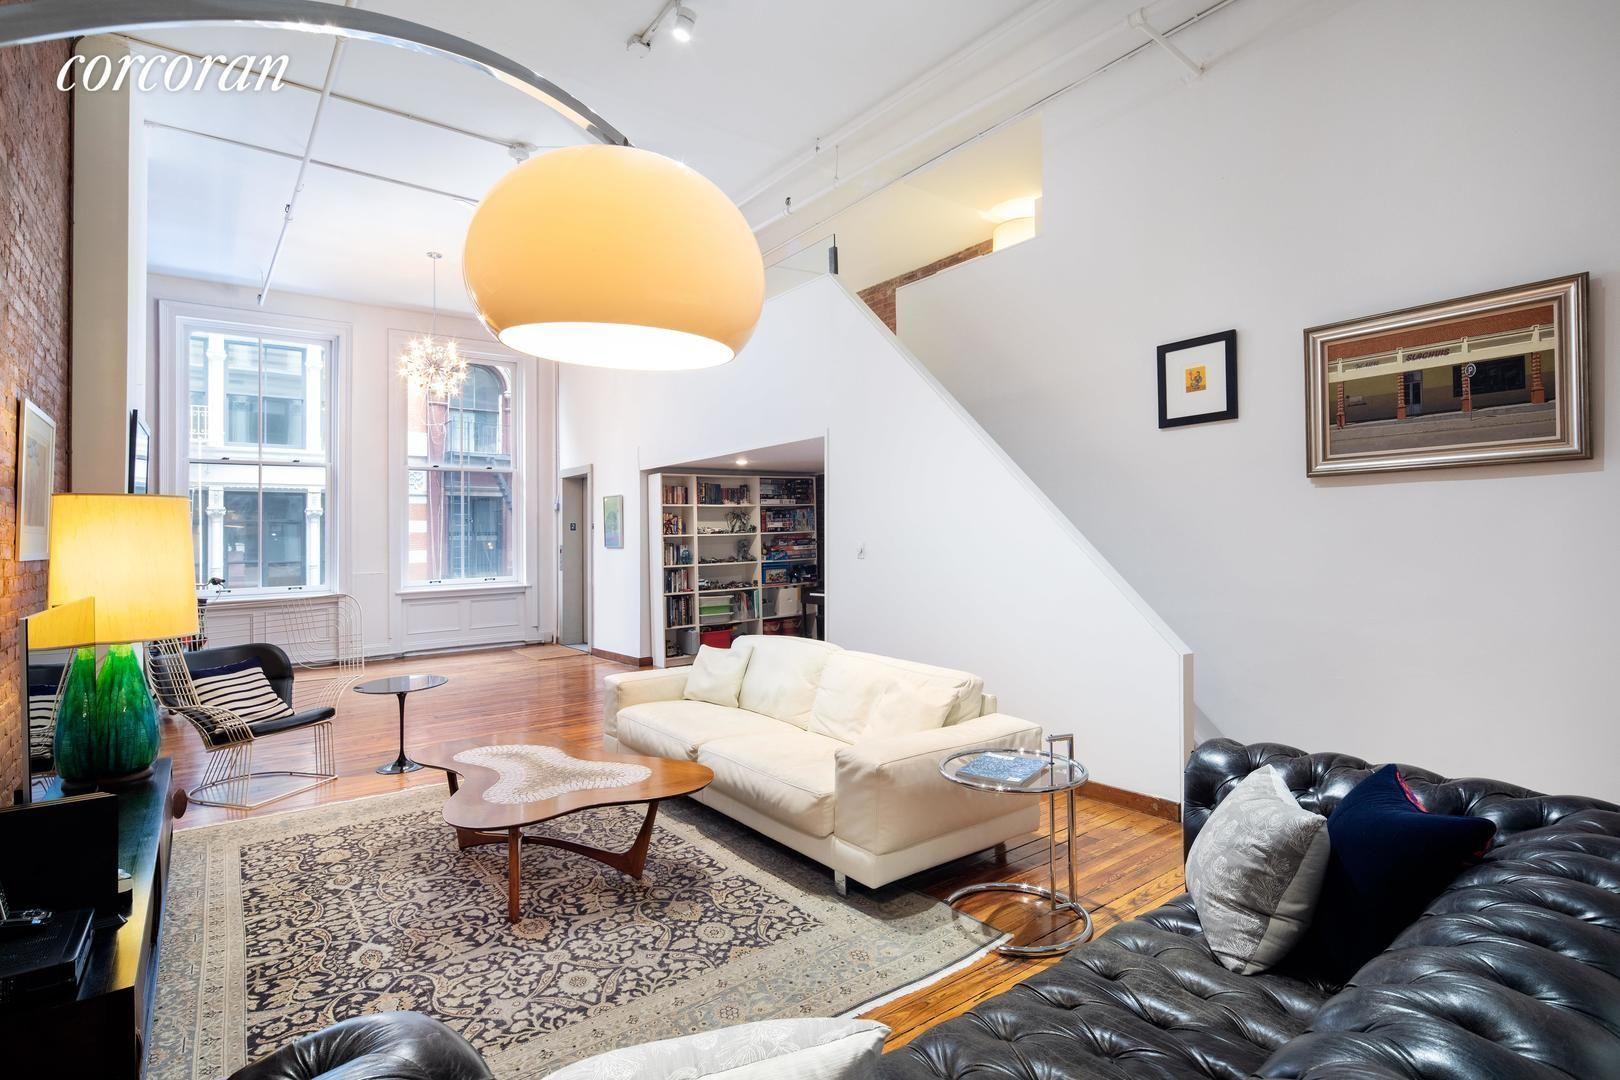 Apartment for sale at 44 Lispenard Street, Apt 2 FL